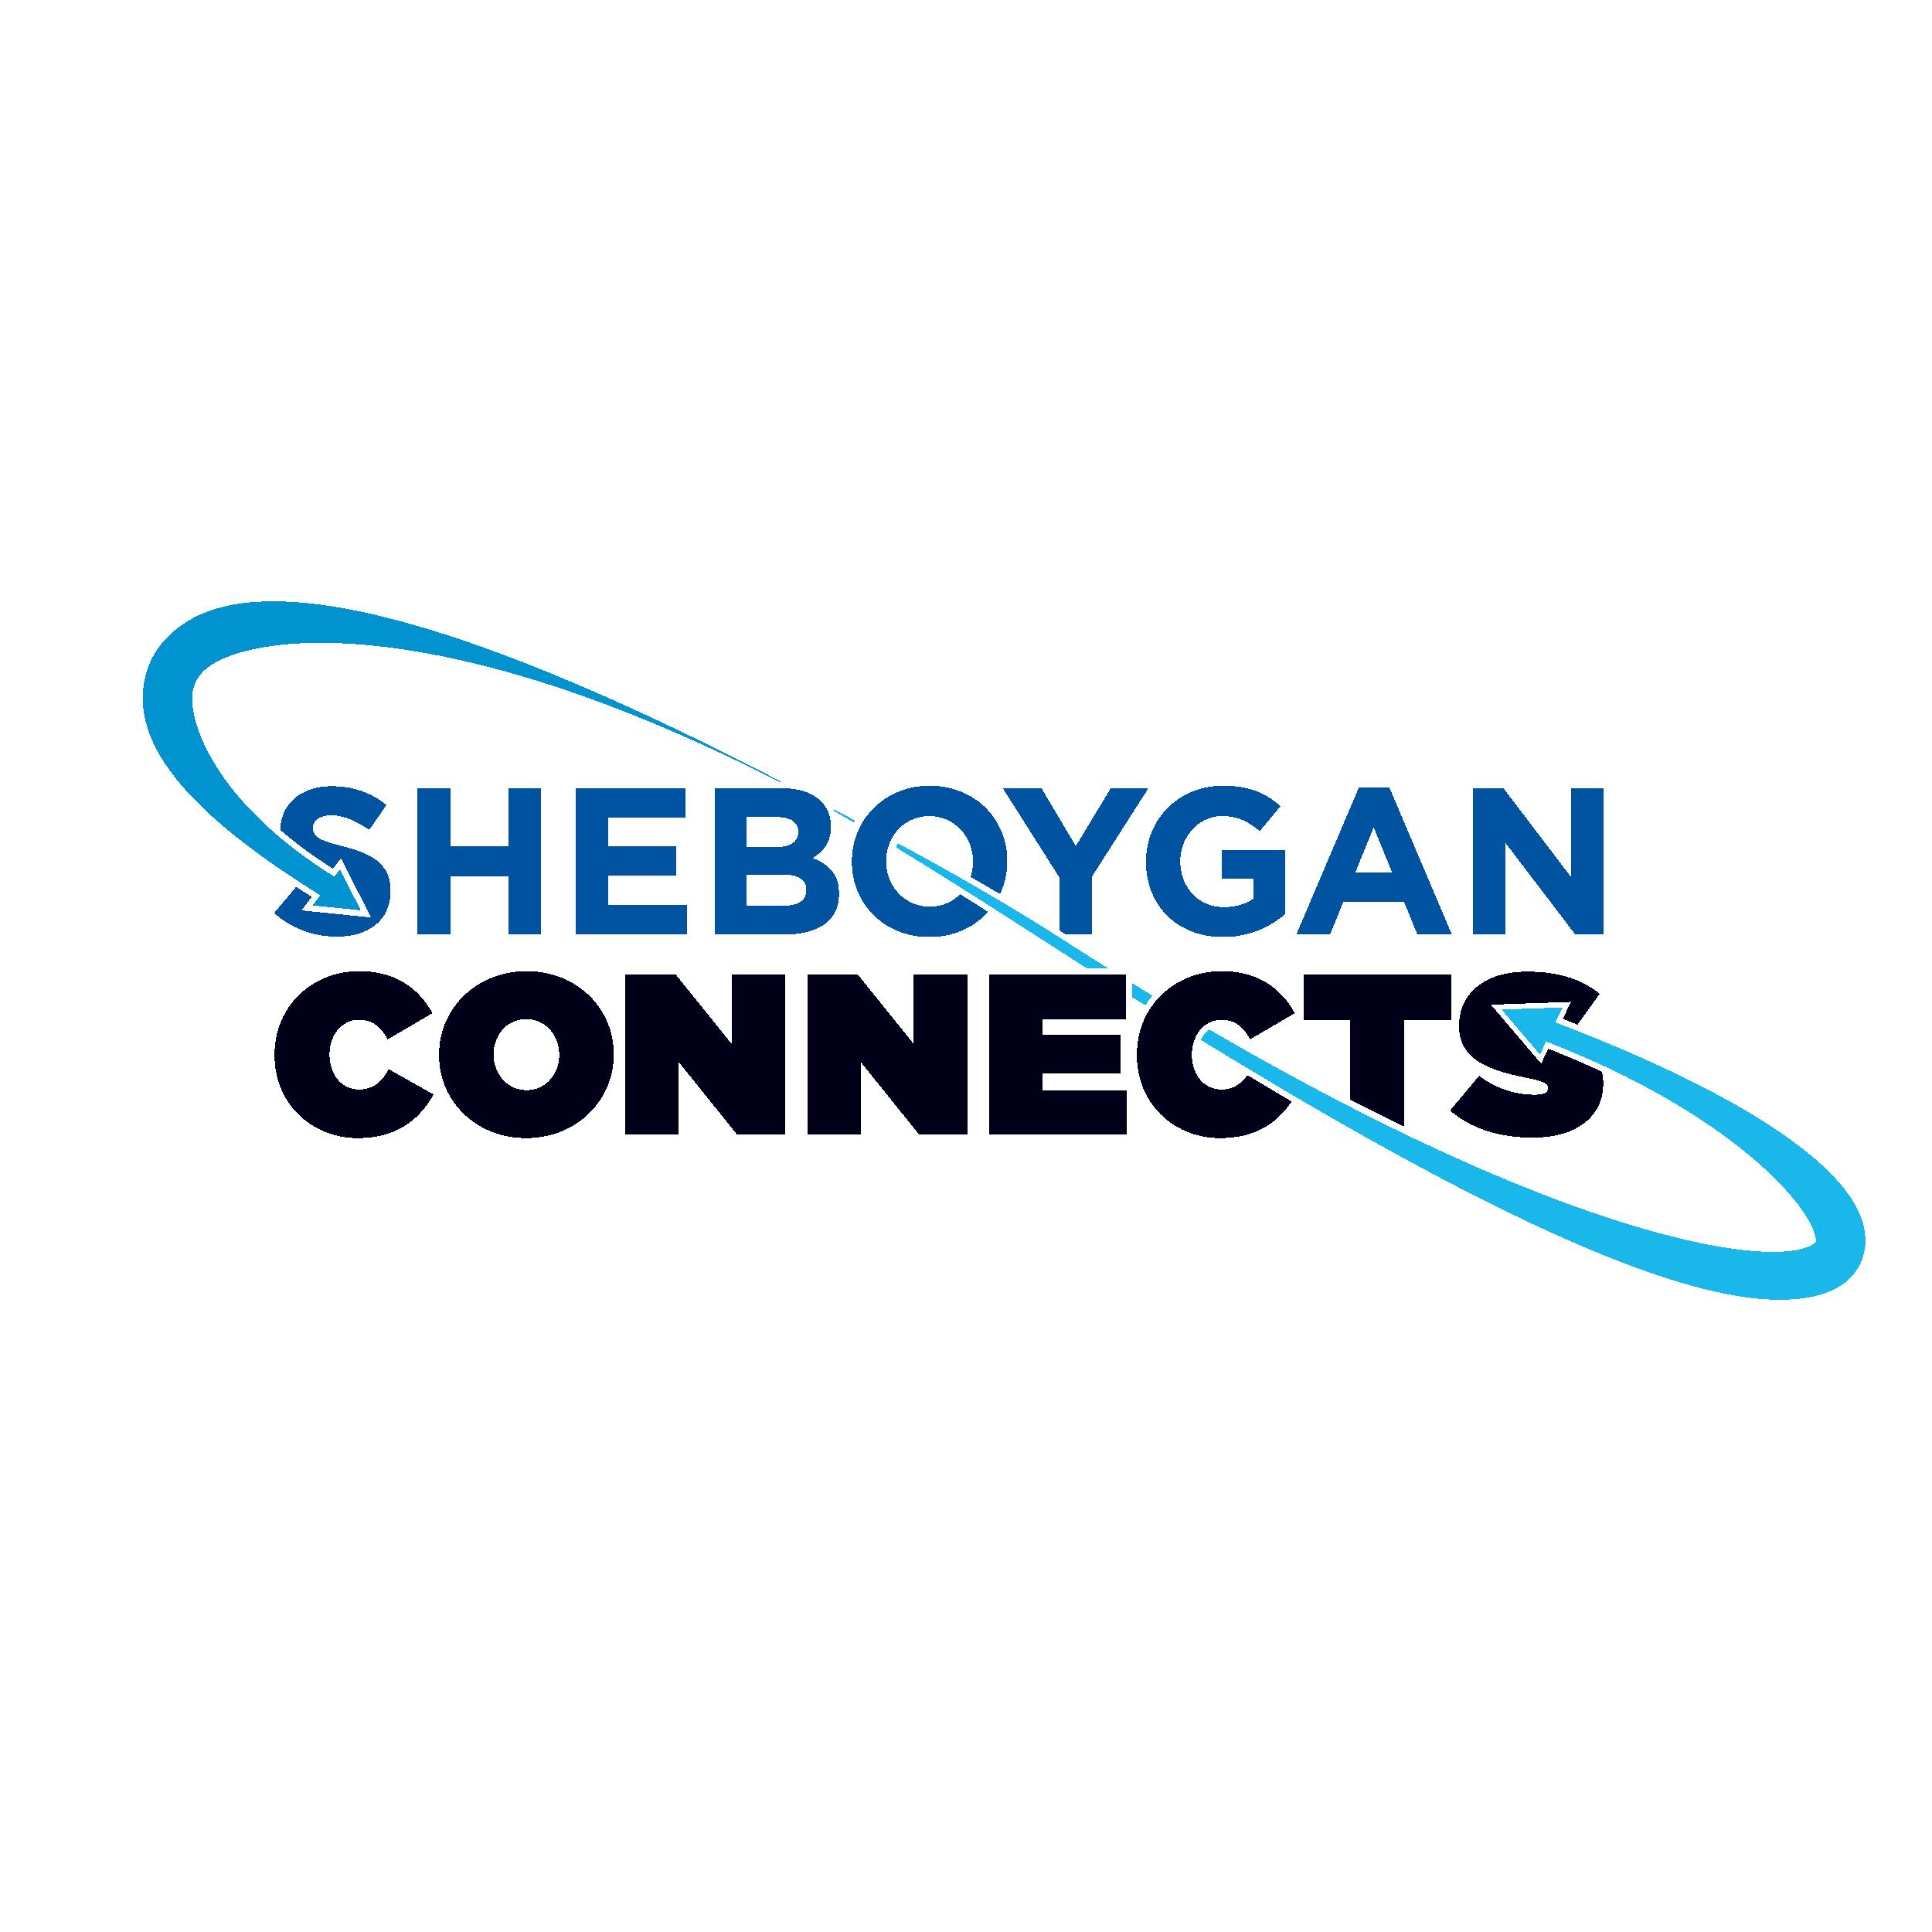 Sheboygan Connects